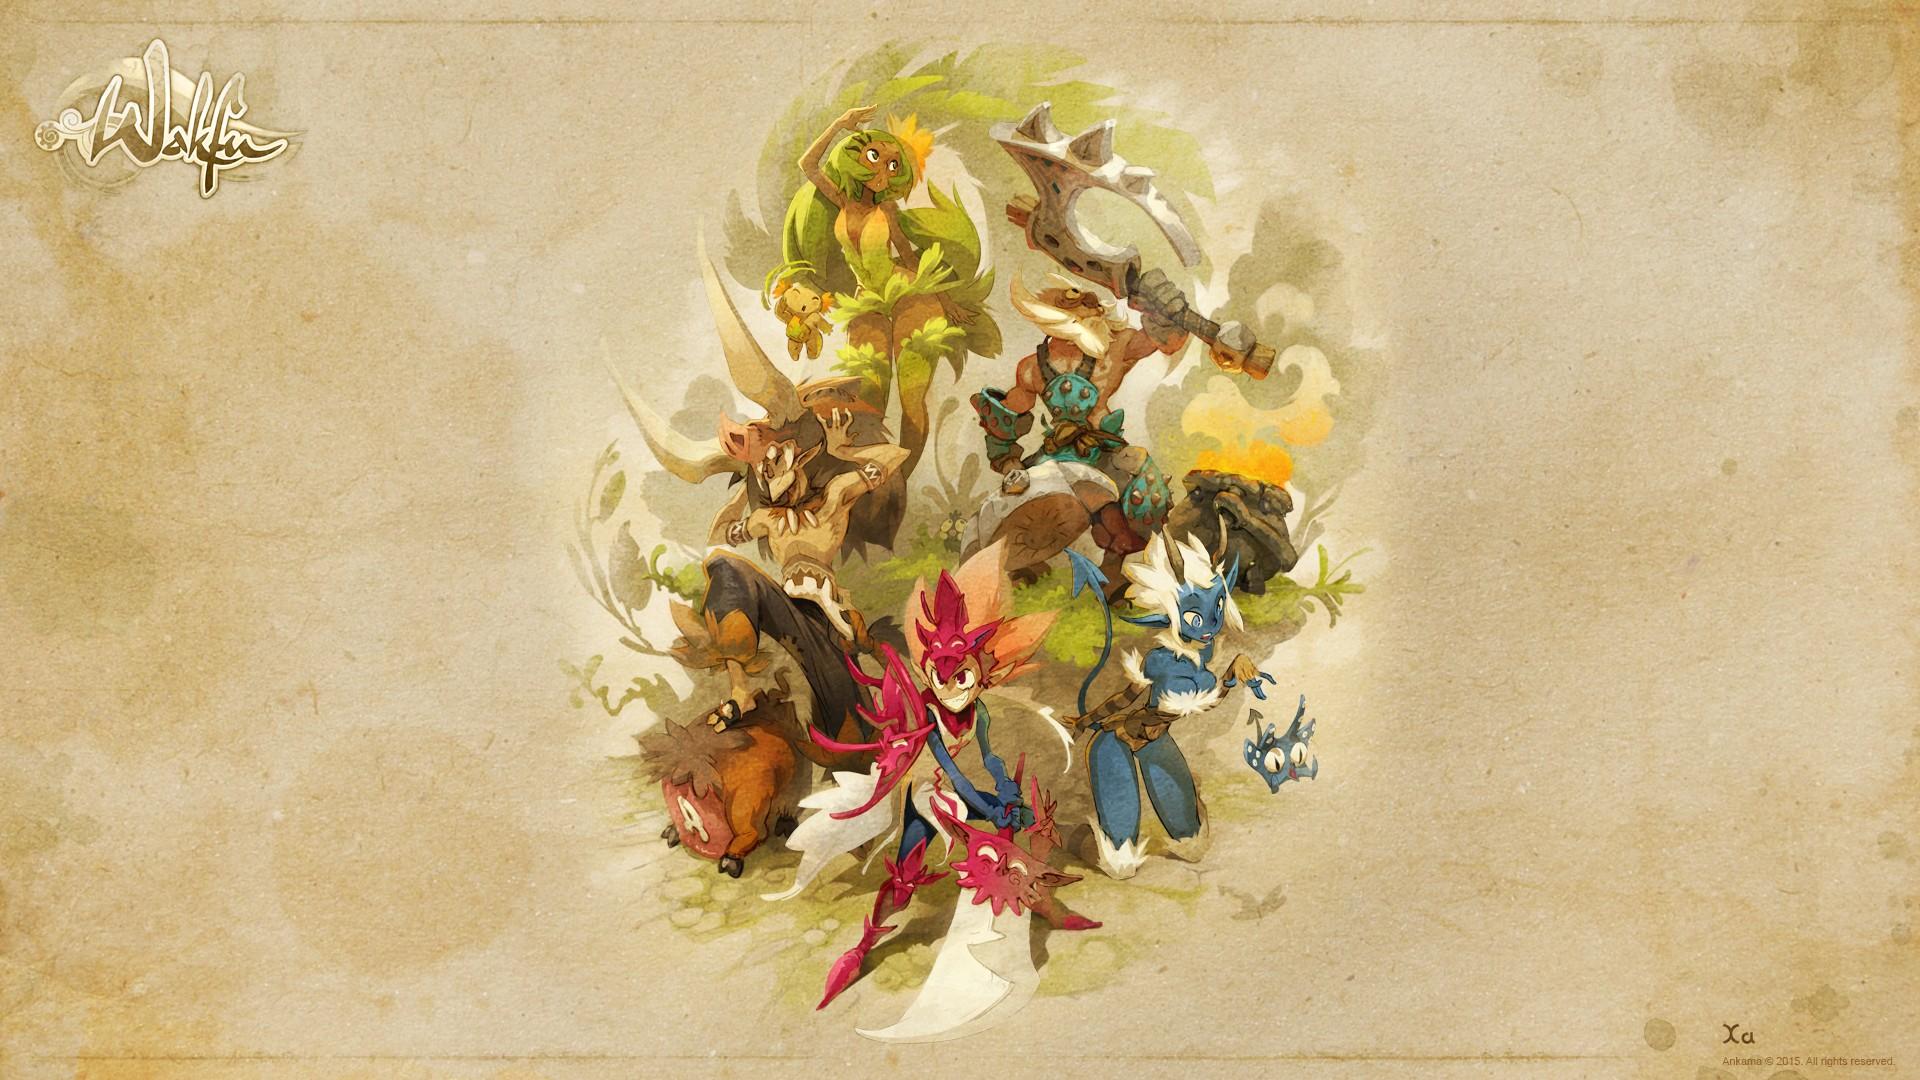 Masaustu Boyama Illustrasyon Dijital Sanat Video Oyunlari